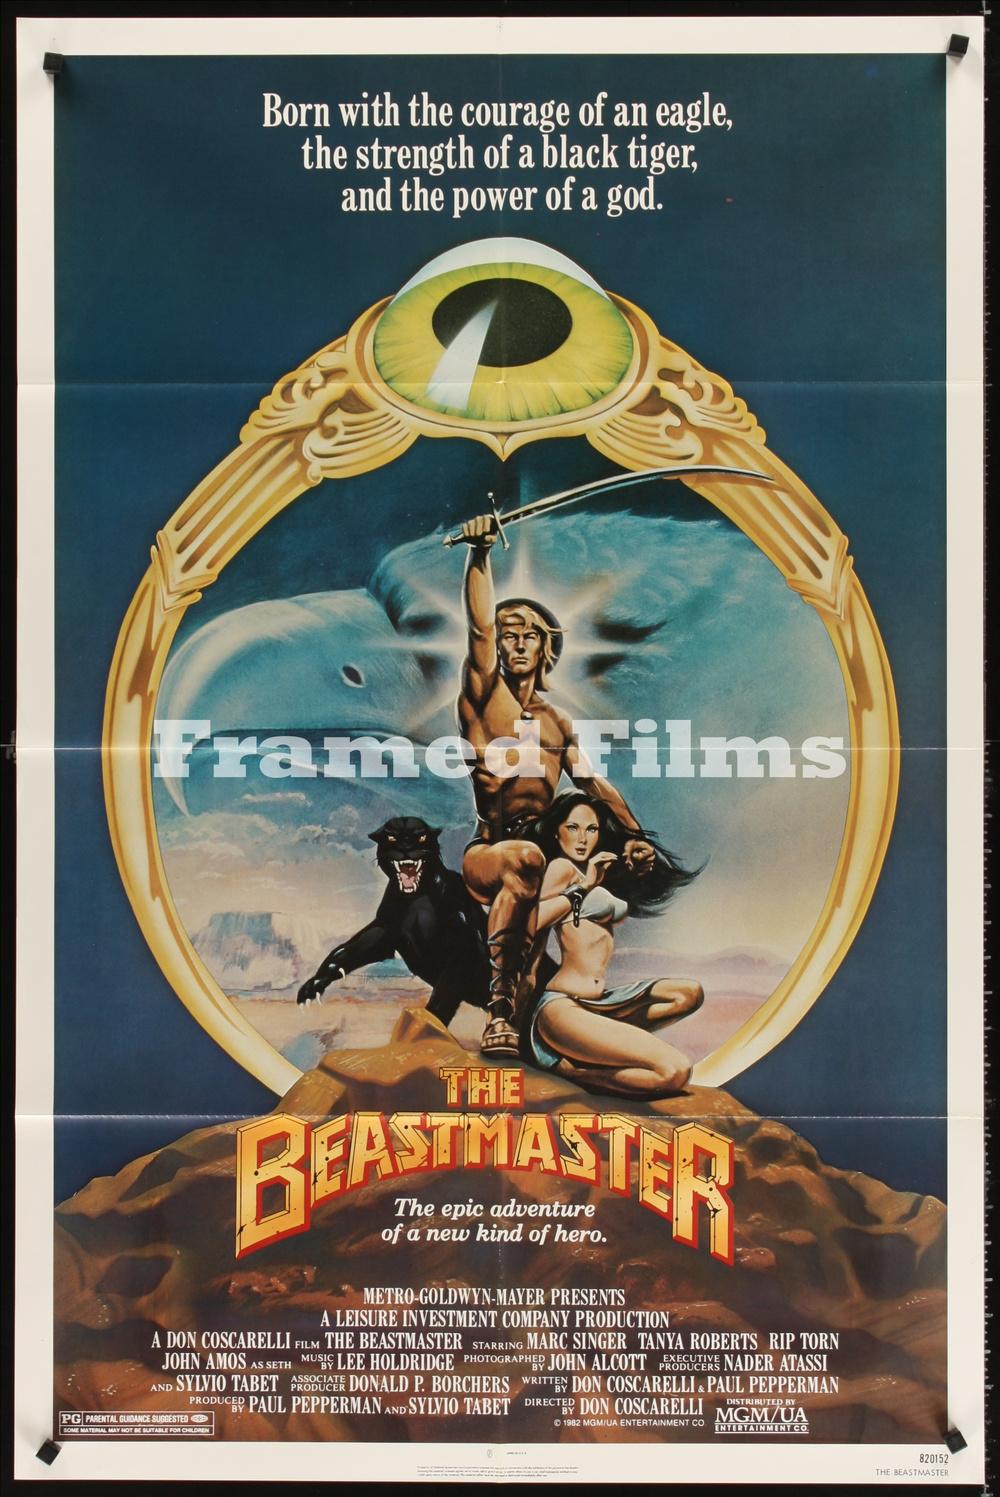 beastmaster_JC02092_L.jpg